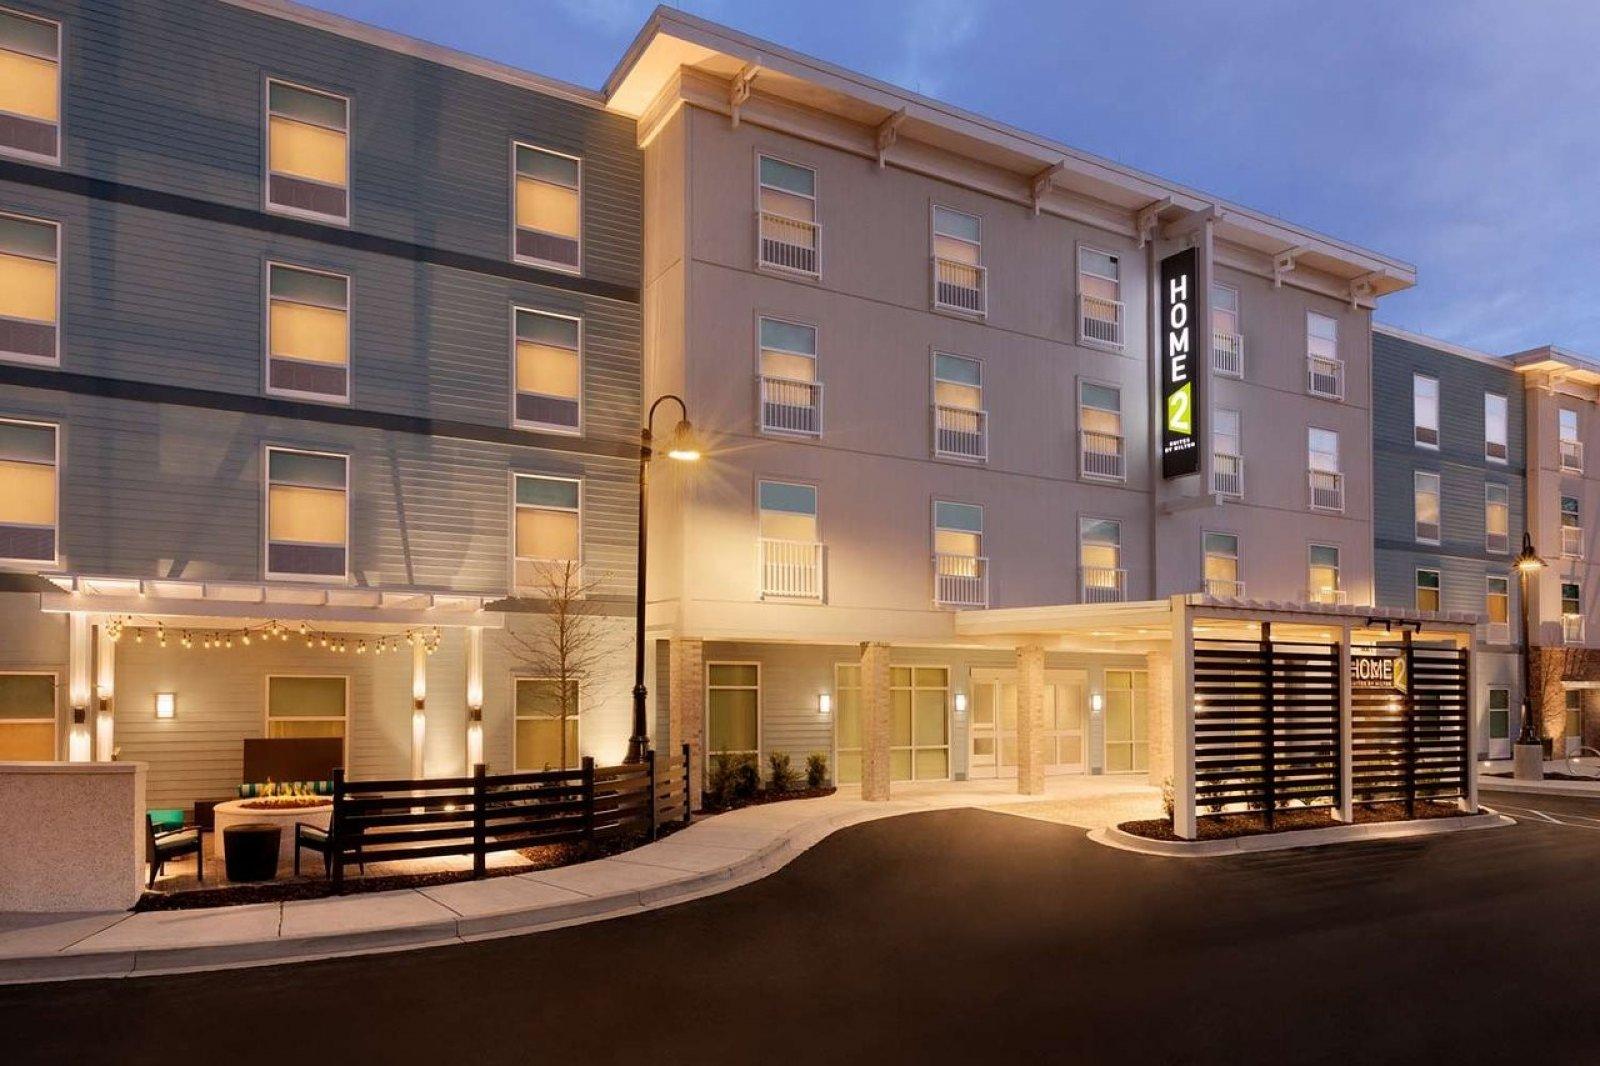 Home2 Suites Mt Pleasant